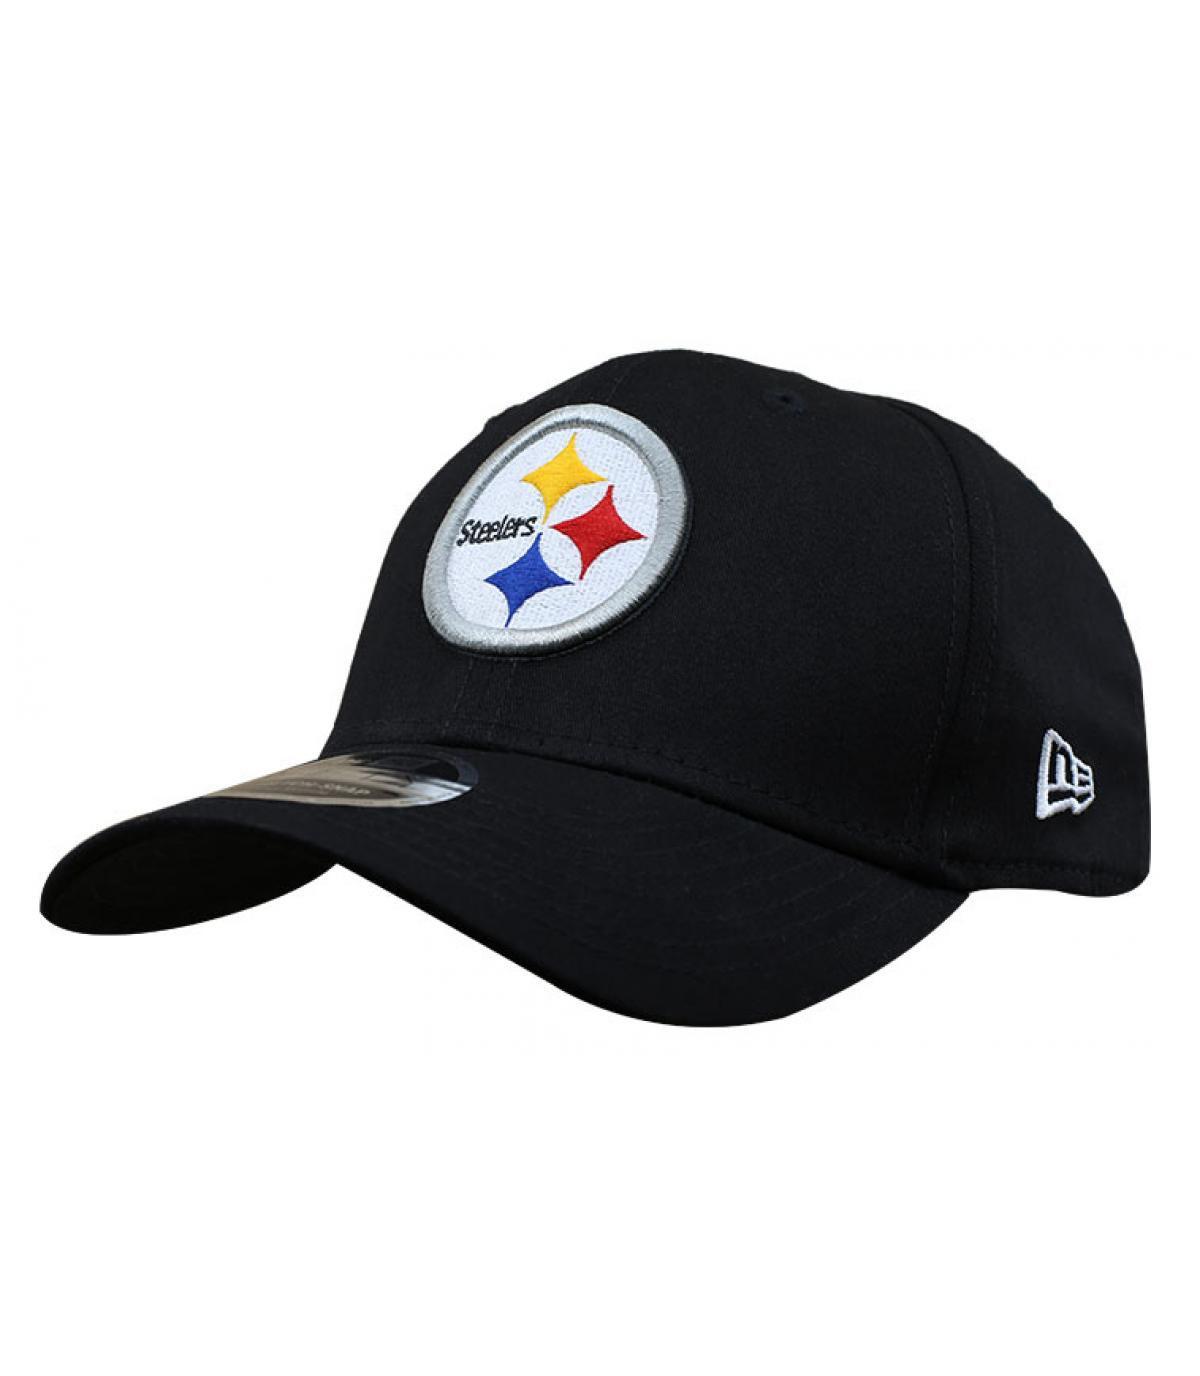 Détails Snapback Team Stretch Steelers 950 - image 2